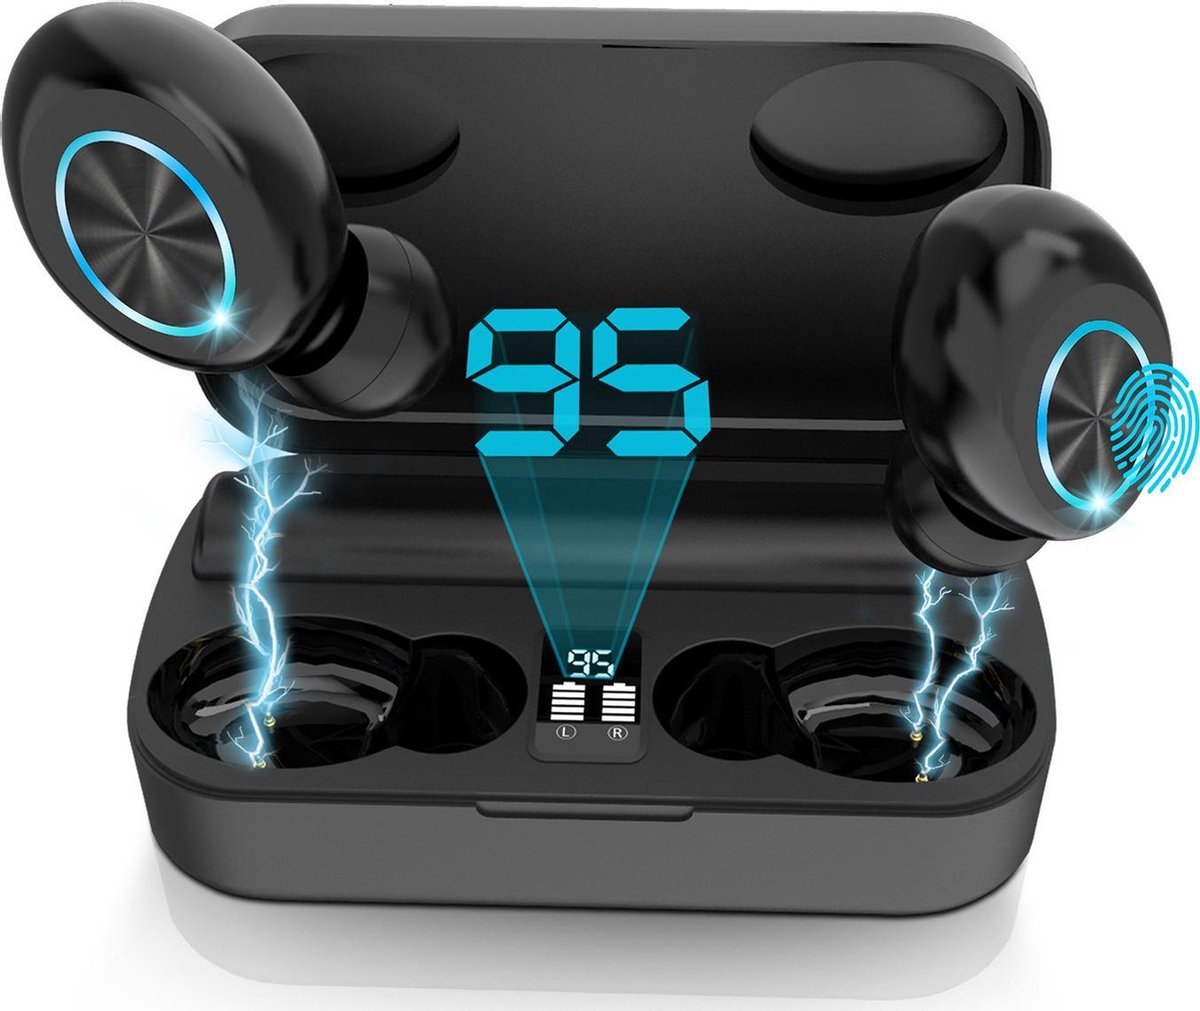 VIP EarBass Draadloze Oordopjes – In-Ear Bluetooth 5.0 Oortjes – Sport Earbuds – IPX5 Waterproof – Met Powerbank – Compact Design voor Apple iPhone Samsung Android Huawei